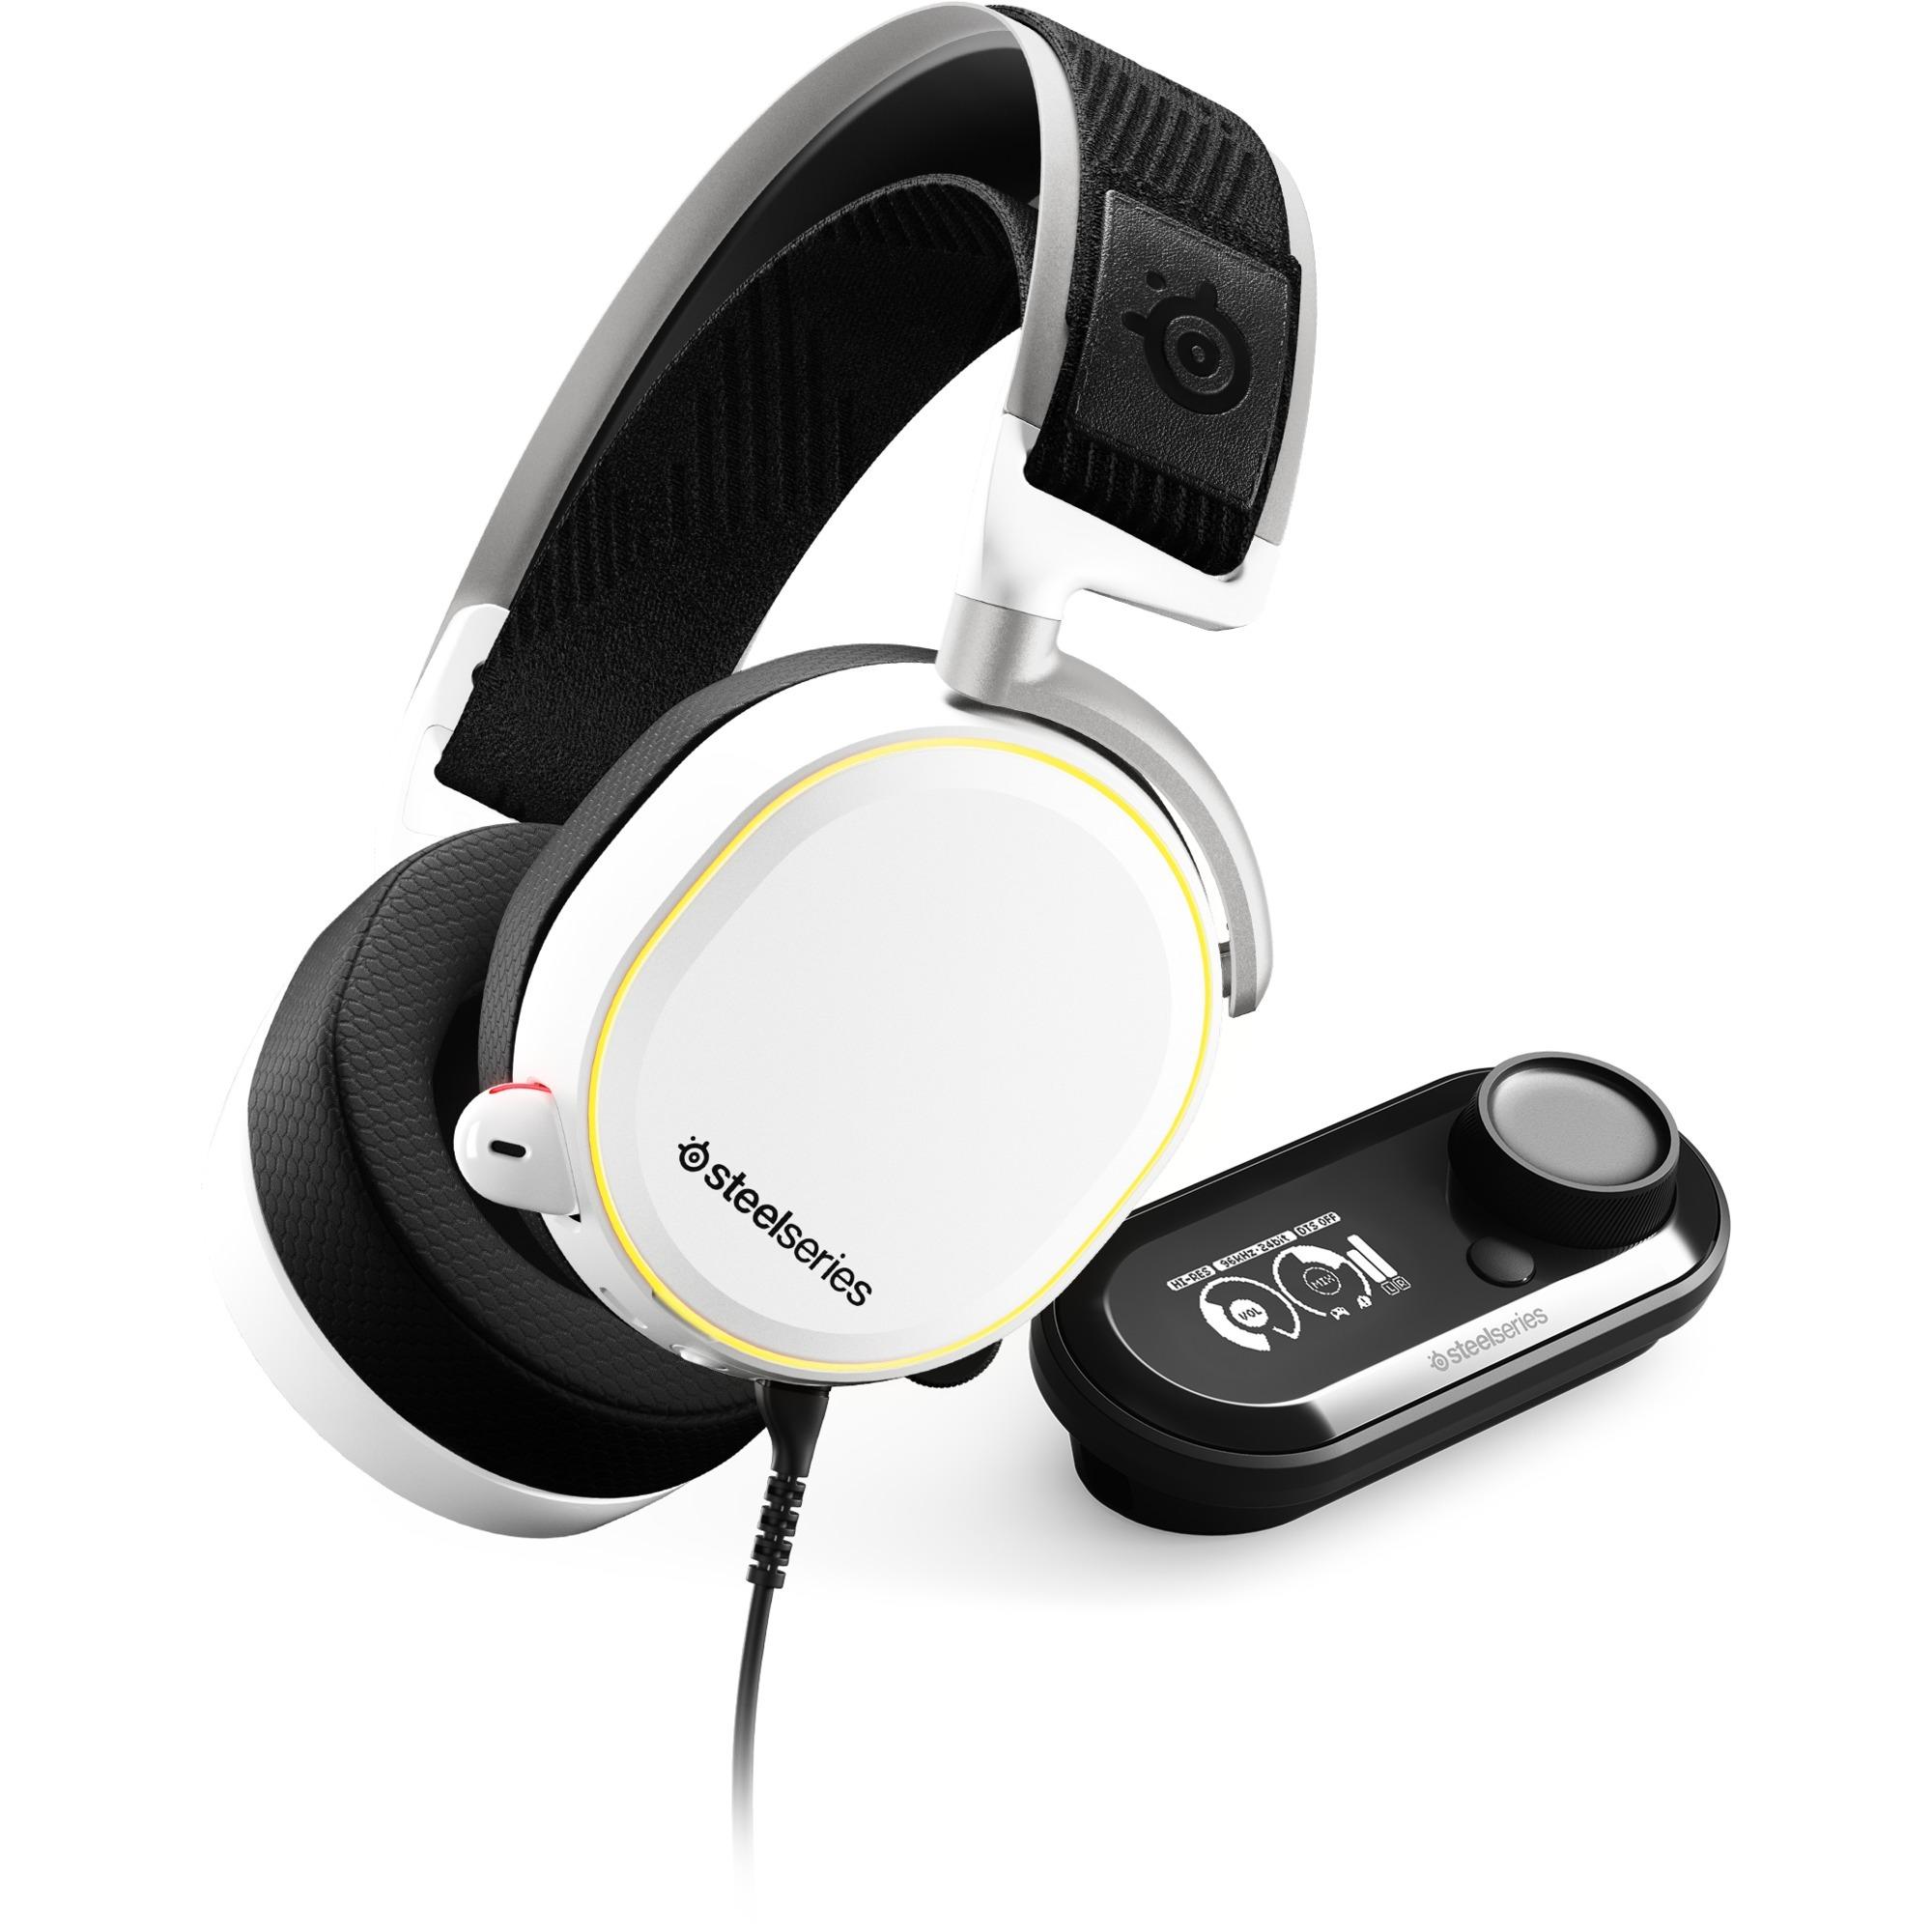 Arctis Pro + GameDAC Auriculares Diadema Blanco, Auriculares para gaming